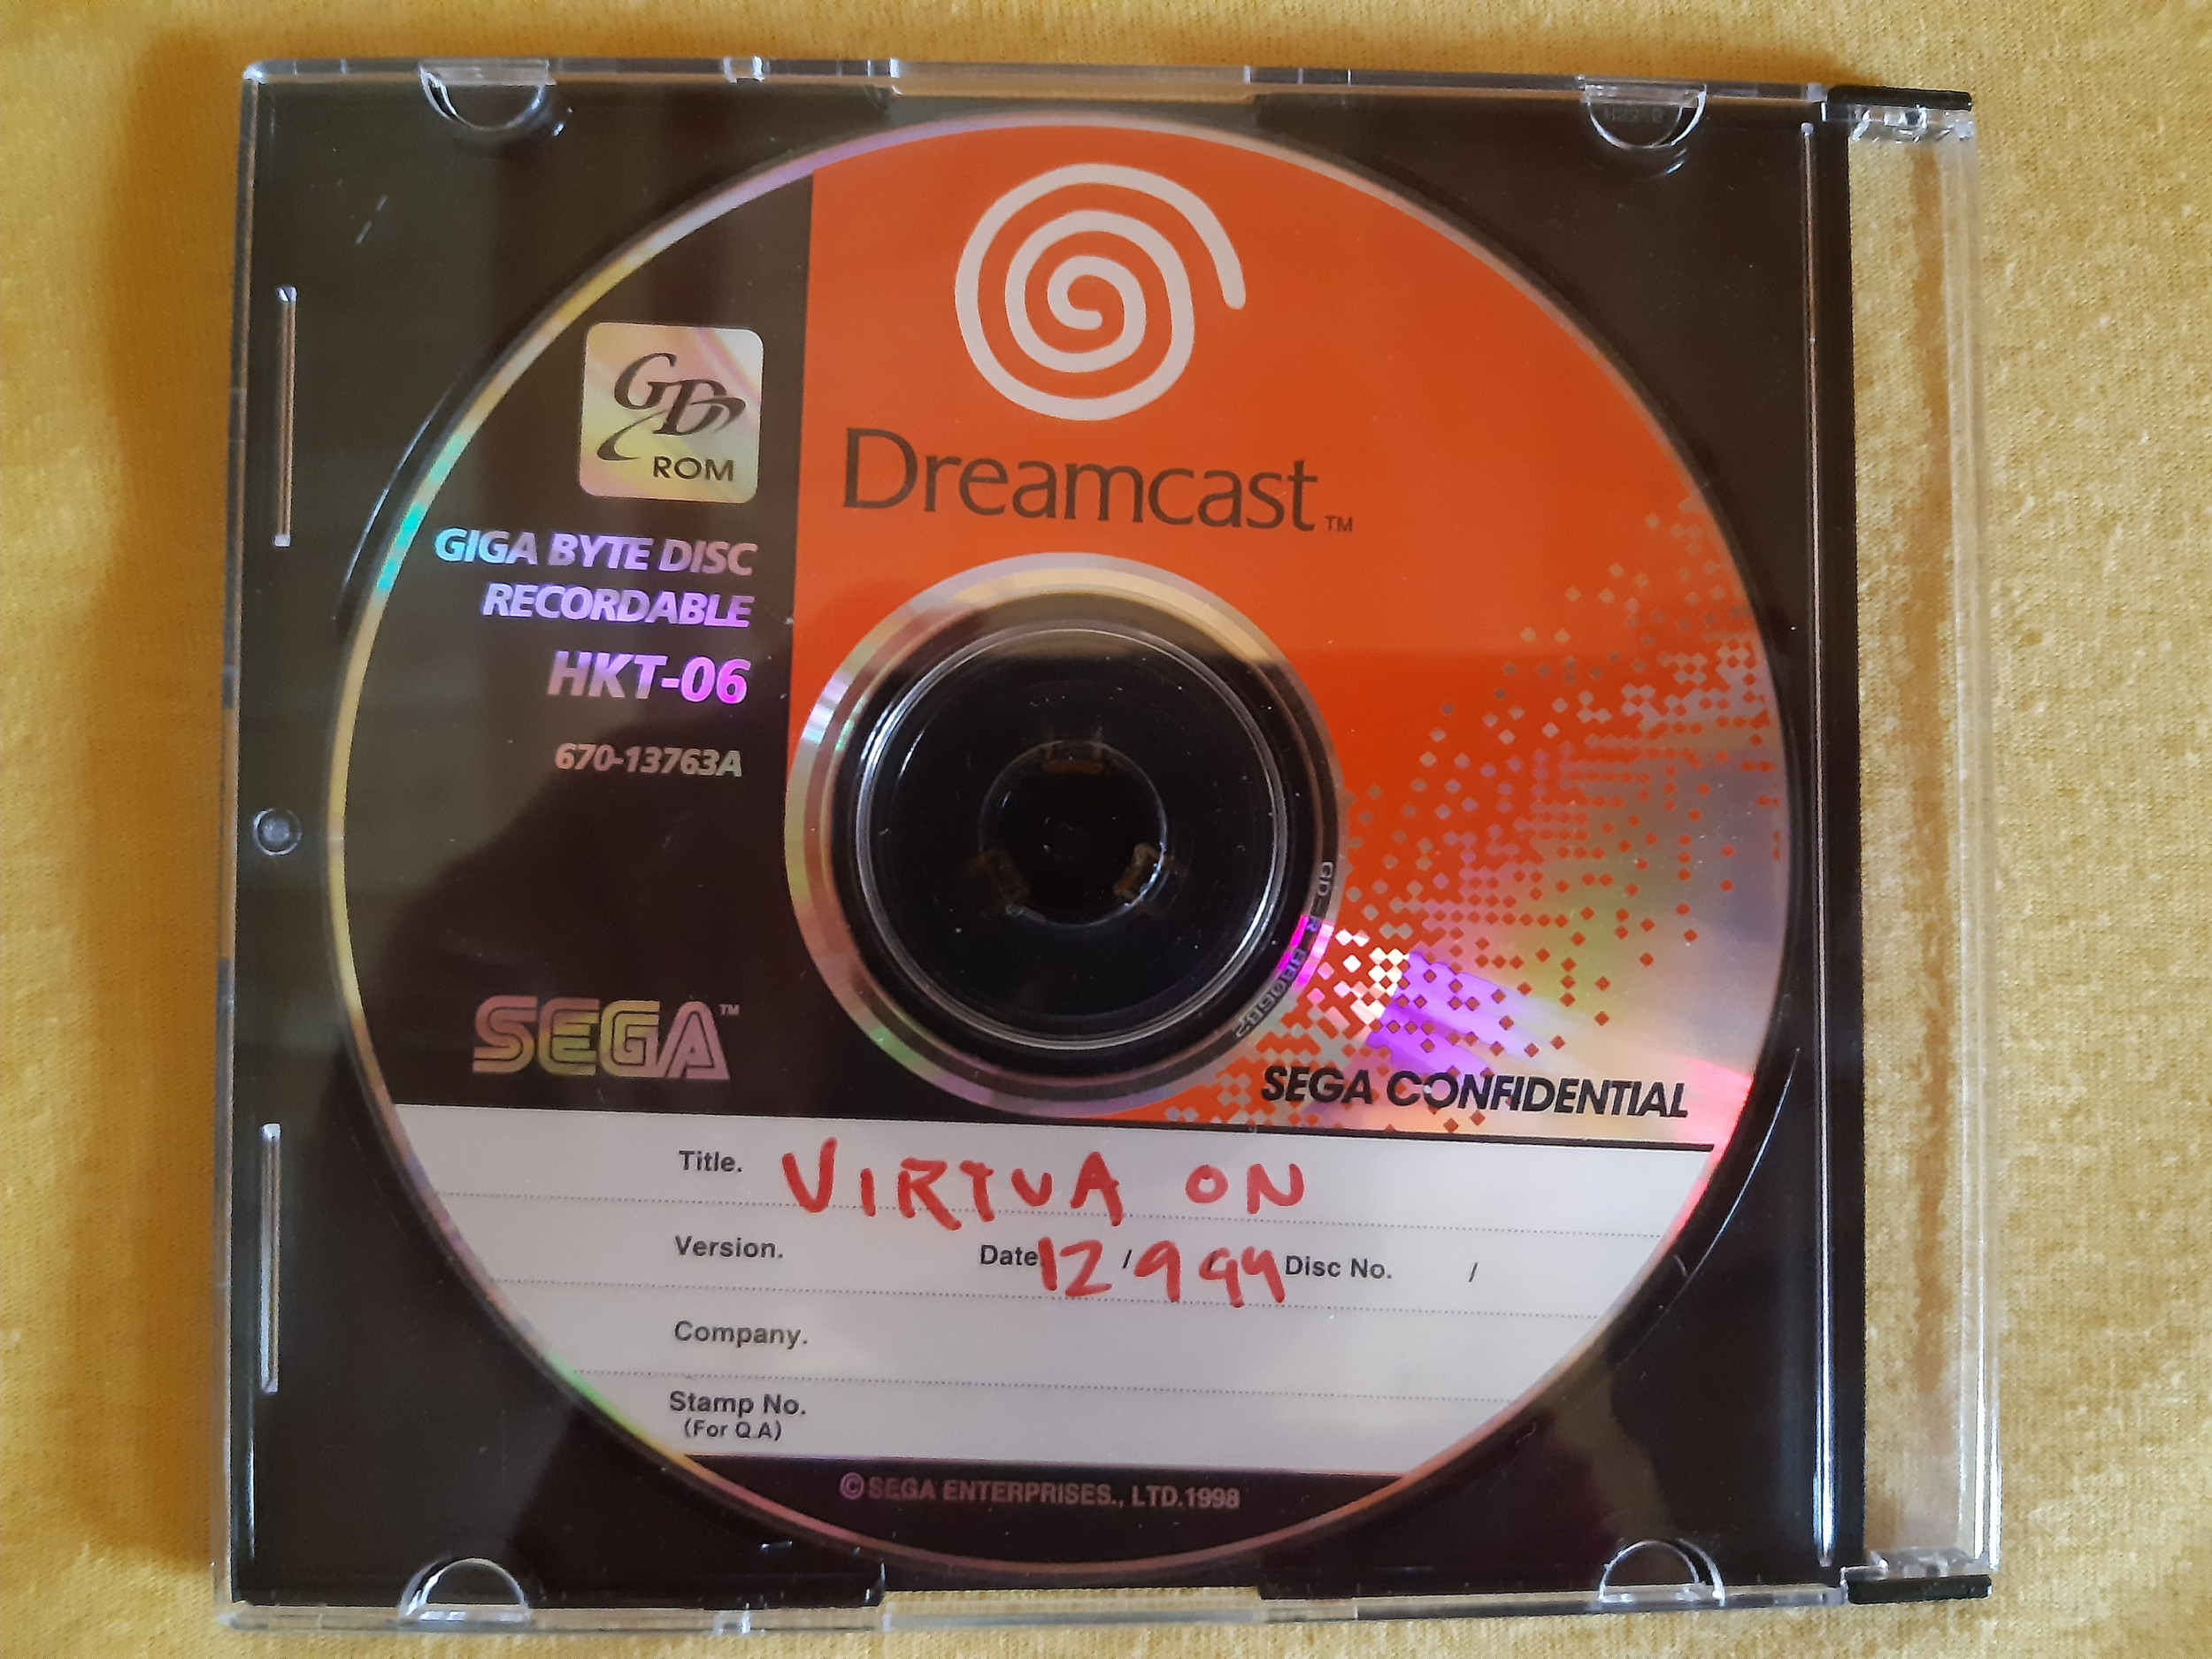 en.sega-dreamcast-info-games-preservation.com